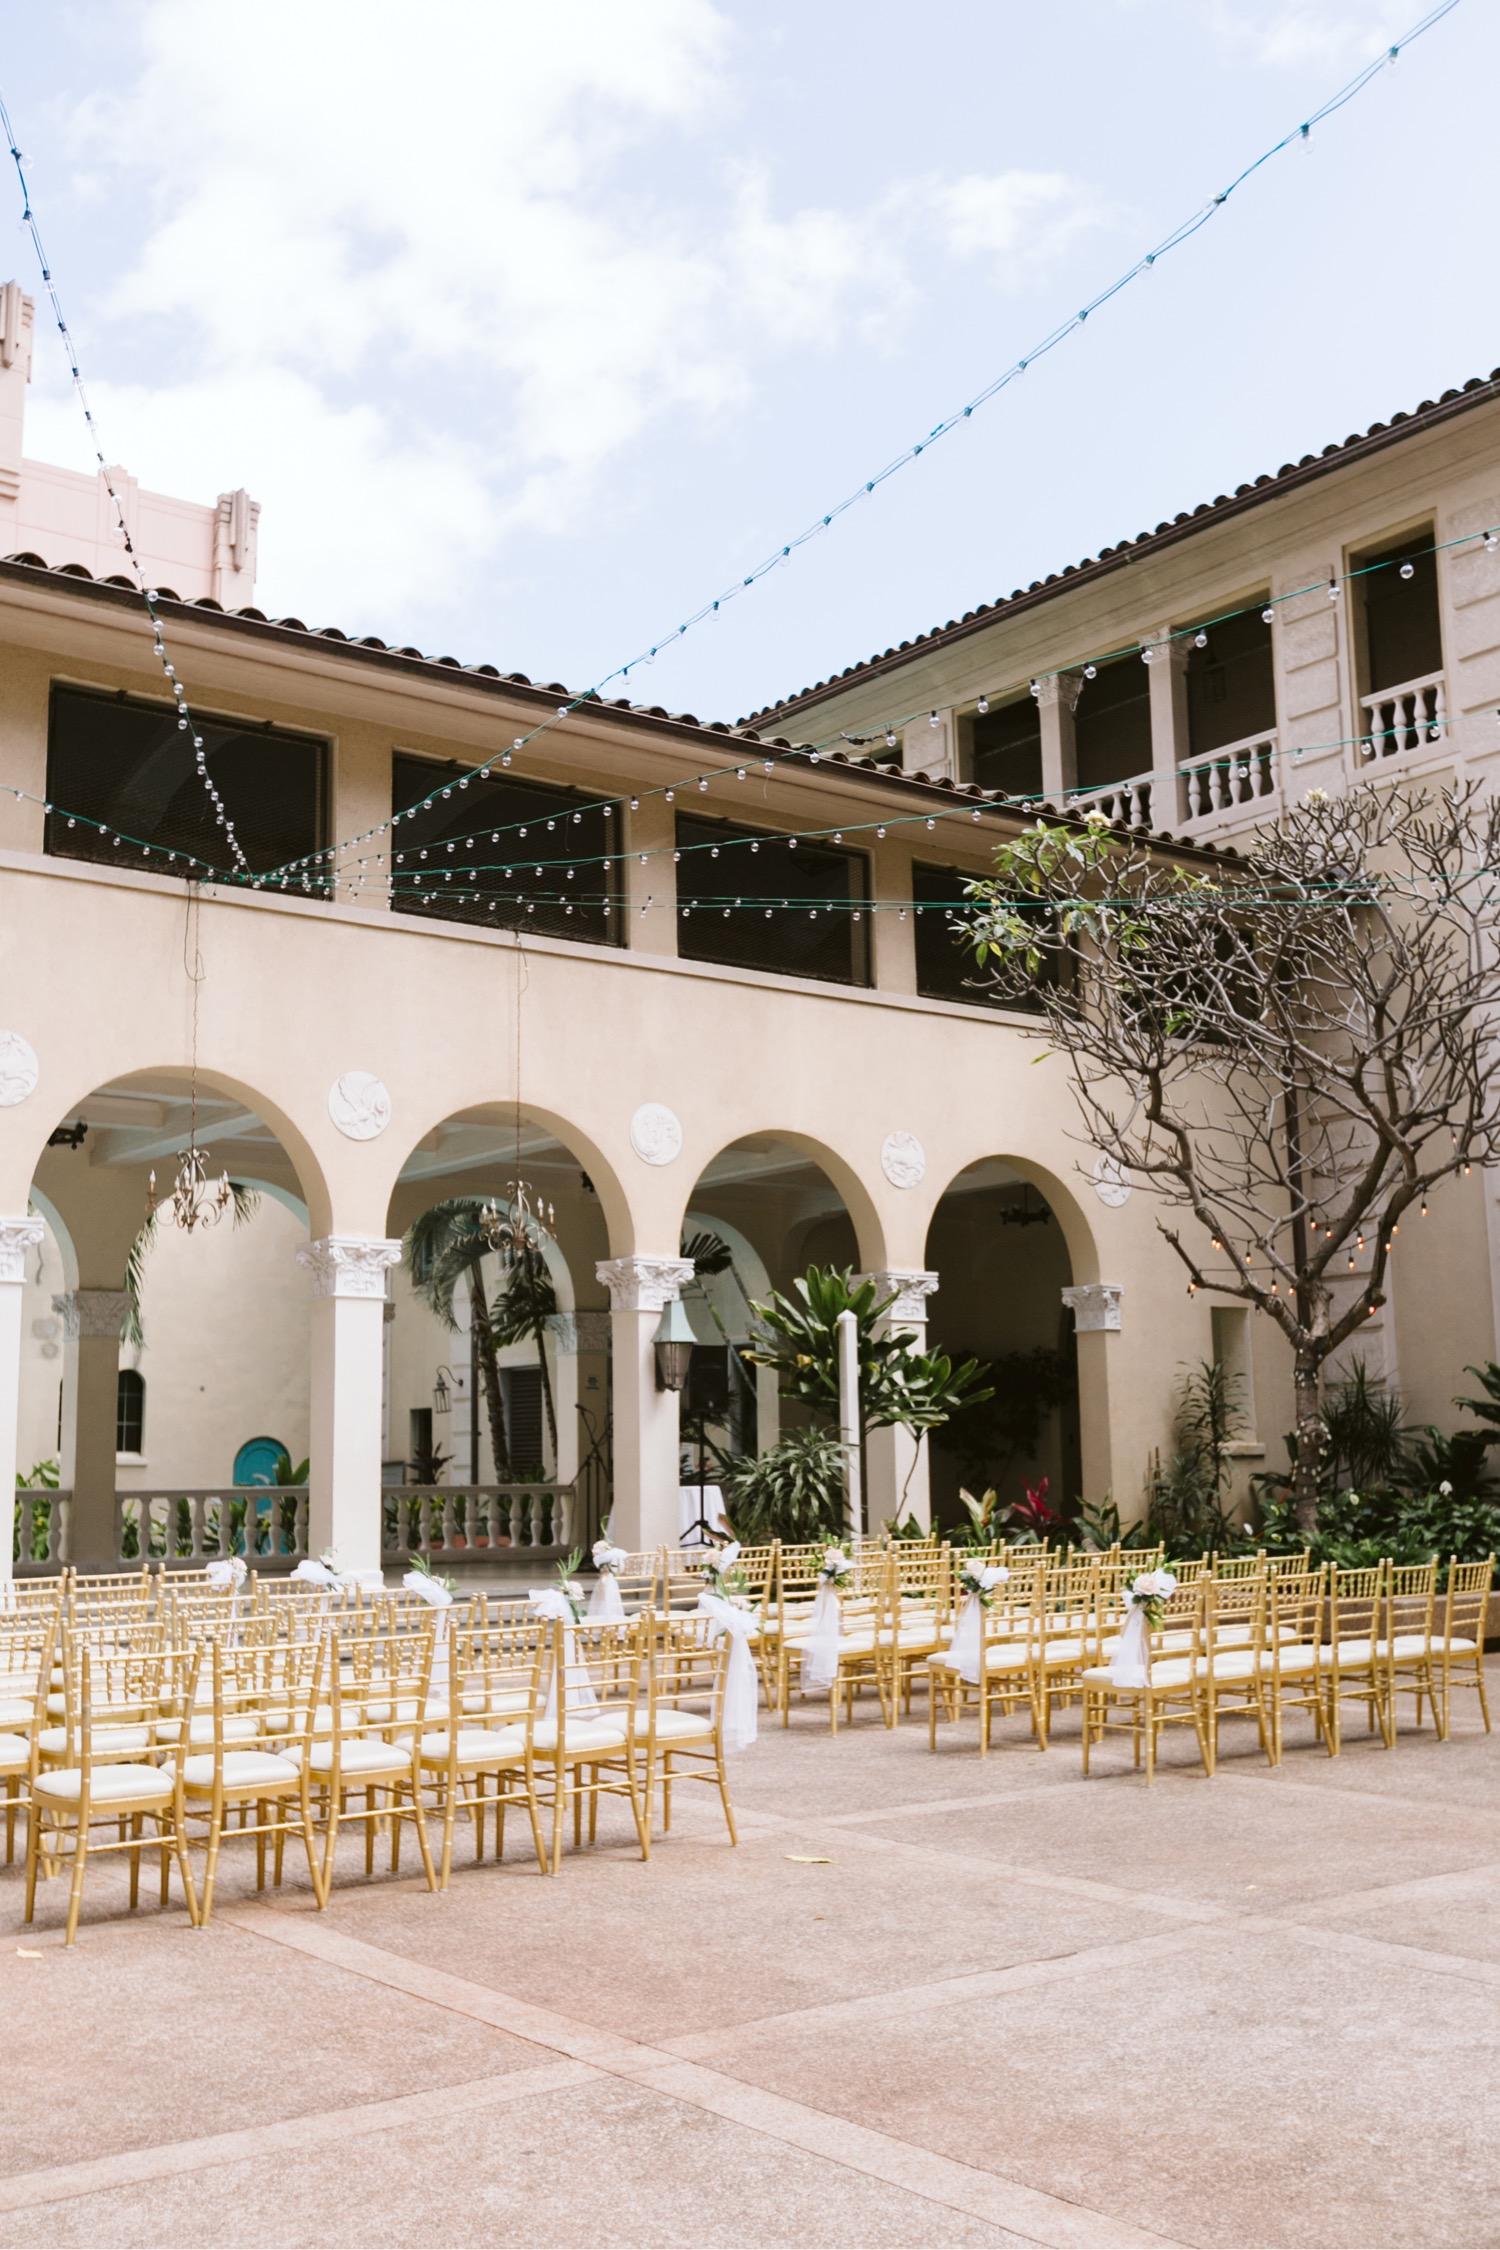 Julia_Chairs_lights_Hawaii_Ceremony_Wedding_Honolulu_Cafe_Setup.jpg